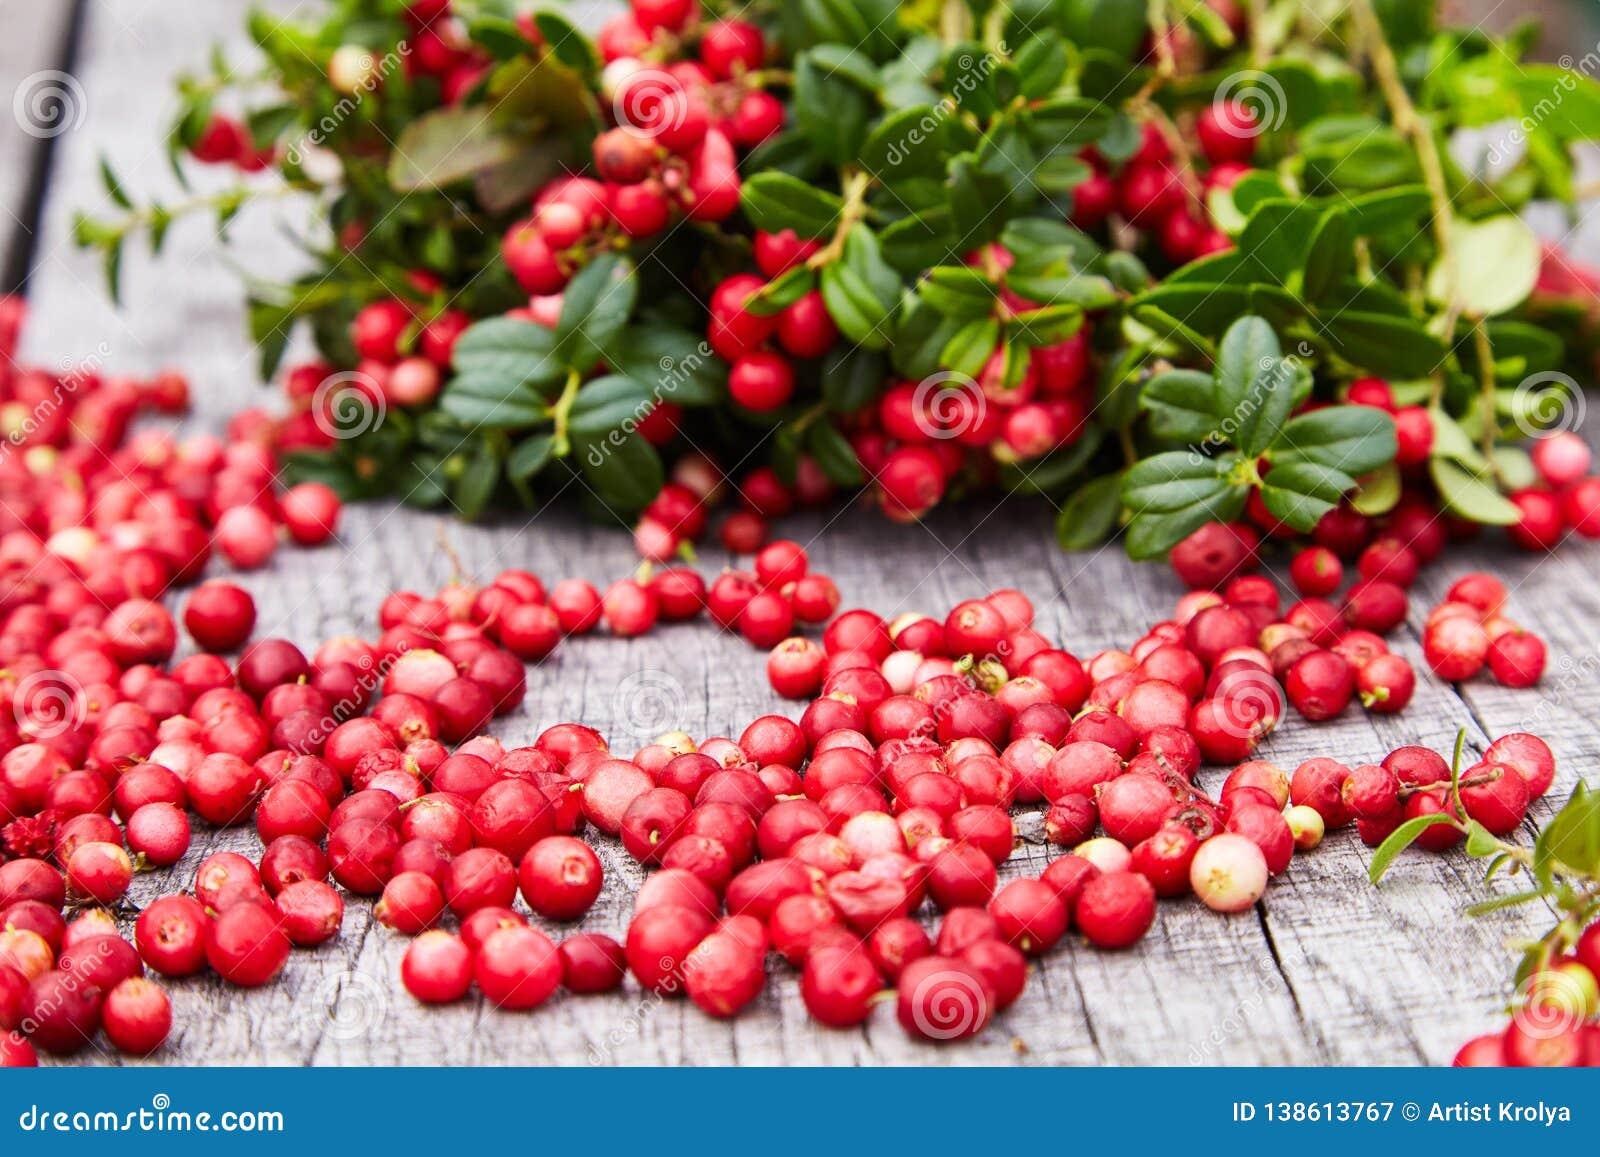 Vaccinium Vitis idaea Berries Of Wild Cowberry Stock Image   Image ...